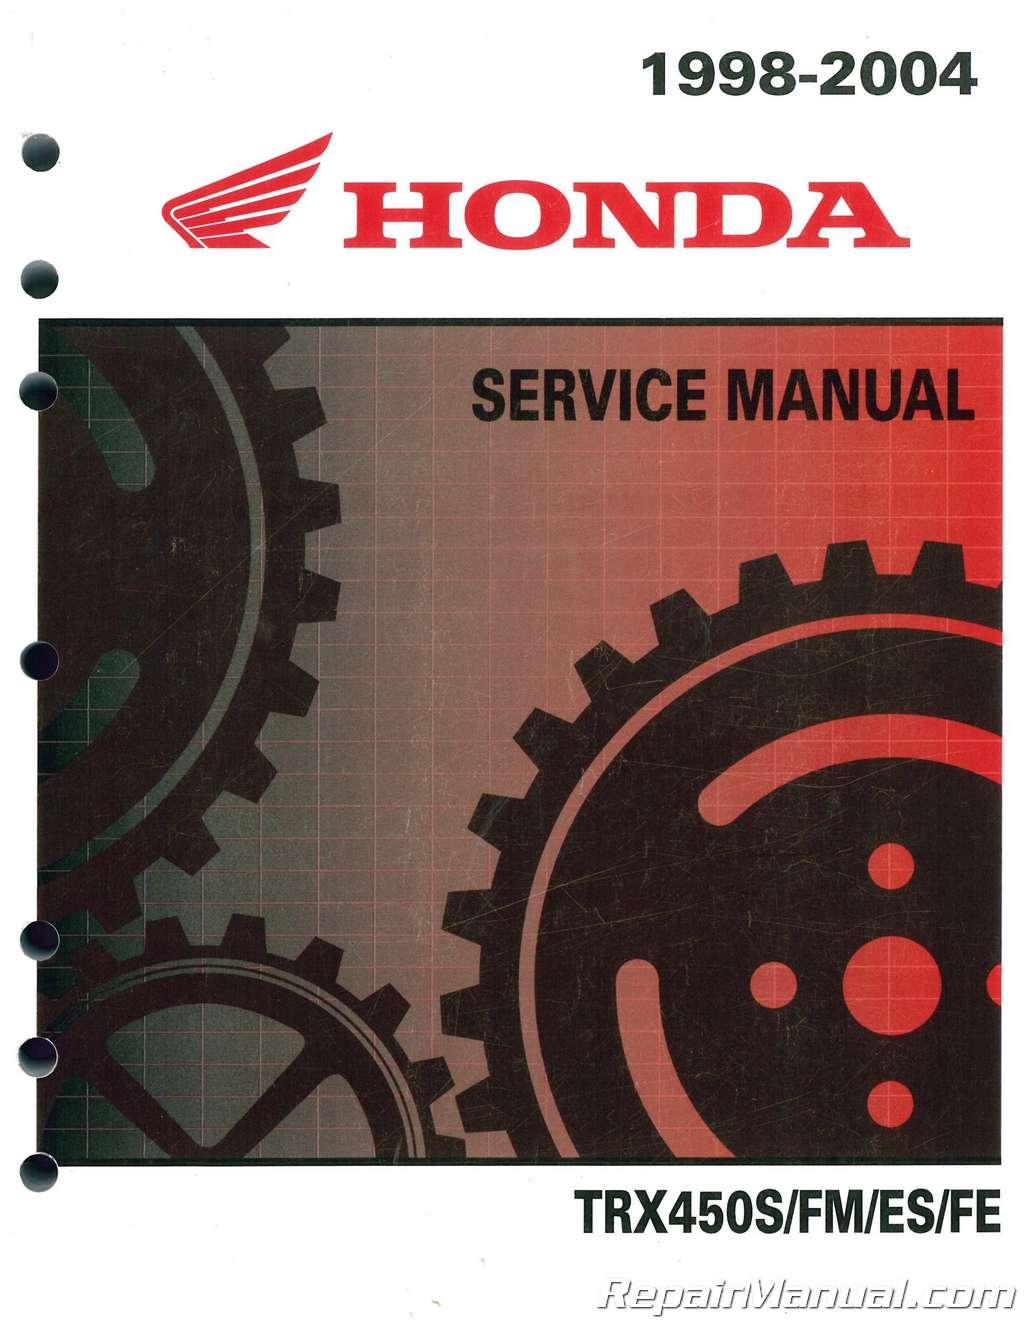 1998-2004-Honda-TRX450FE-FM-FourTrax-Foreman-ATV- ...